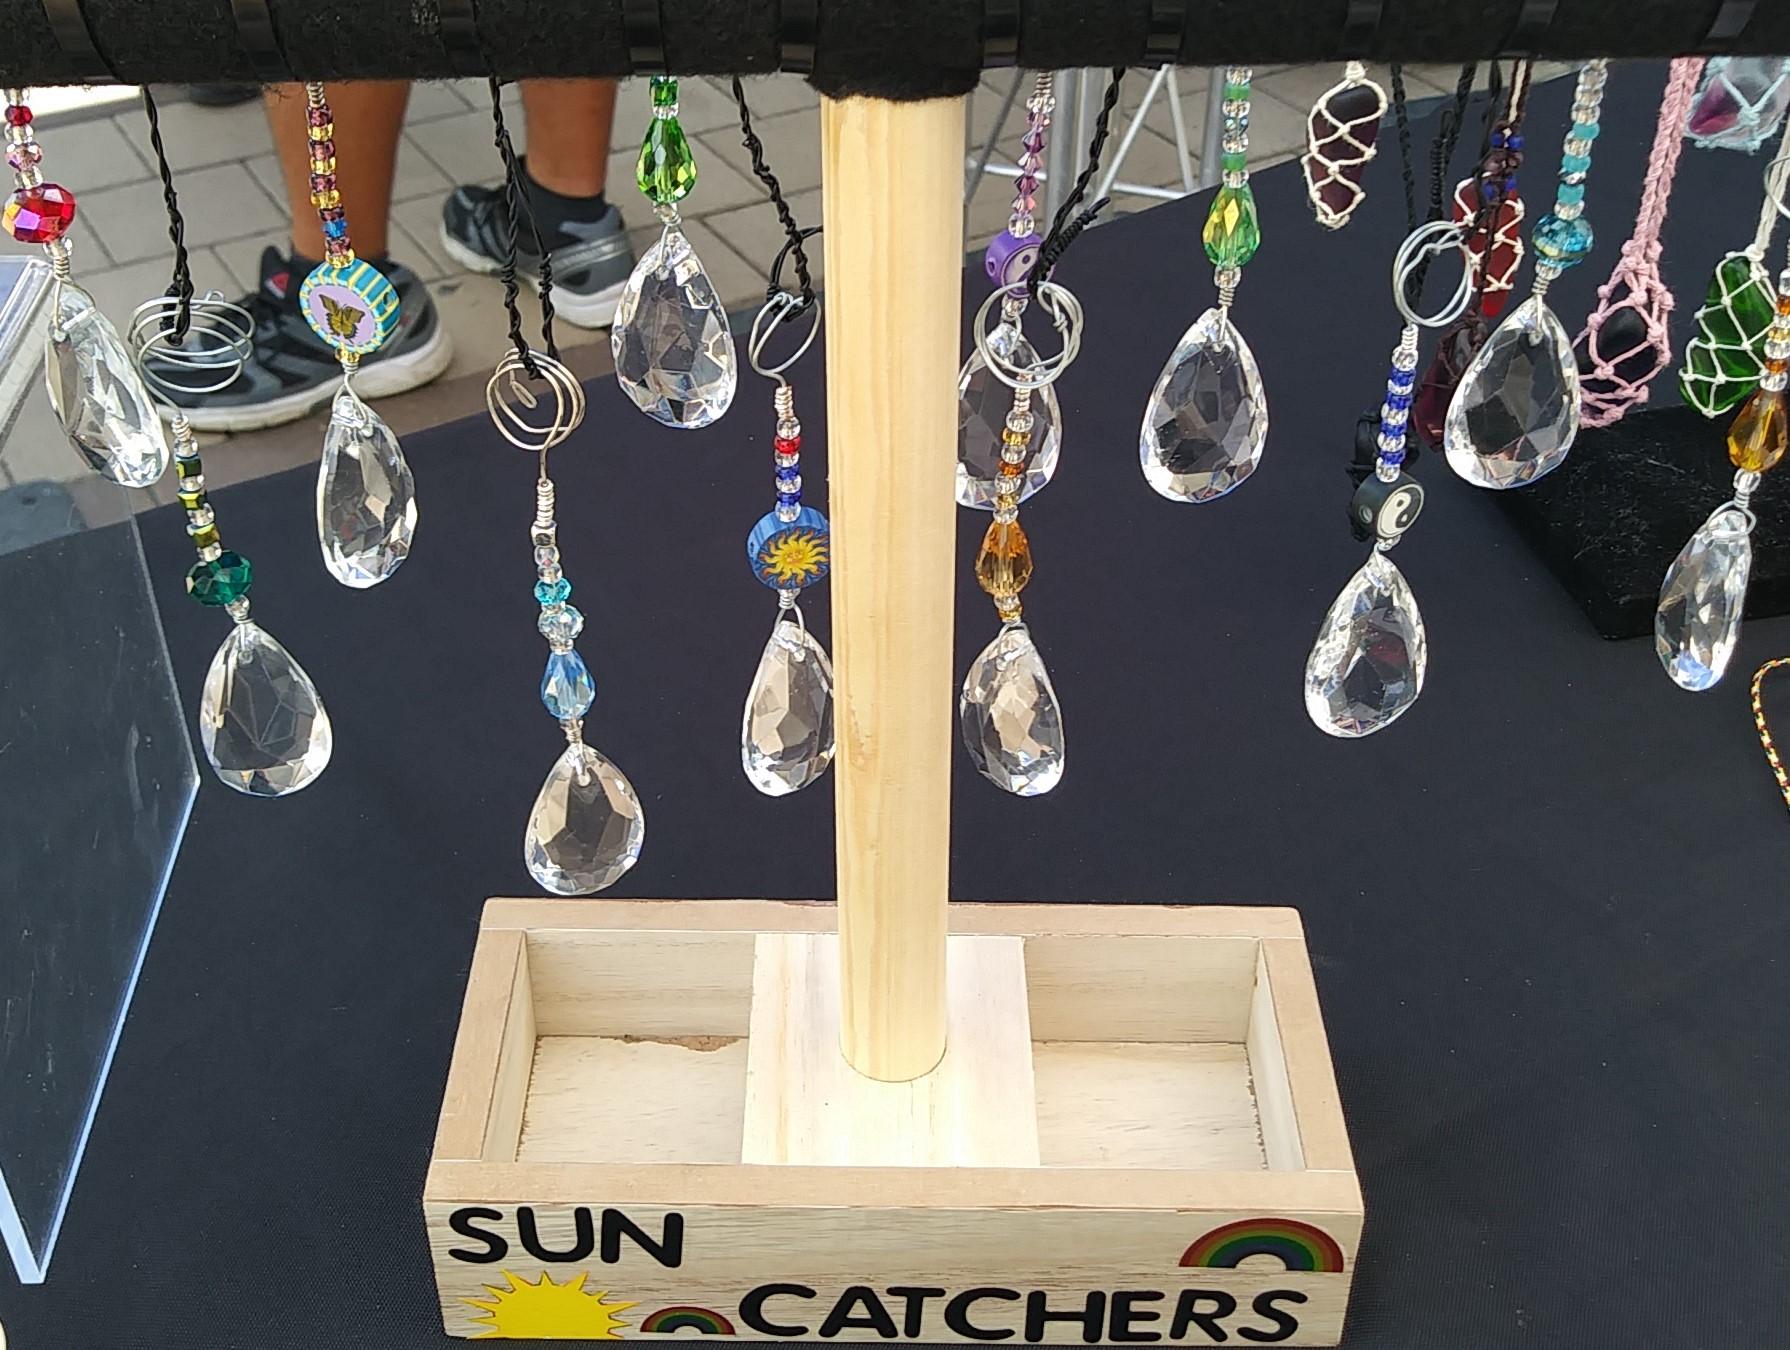 Sun-catchers Make Rainbows!